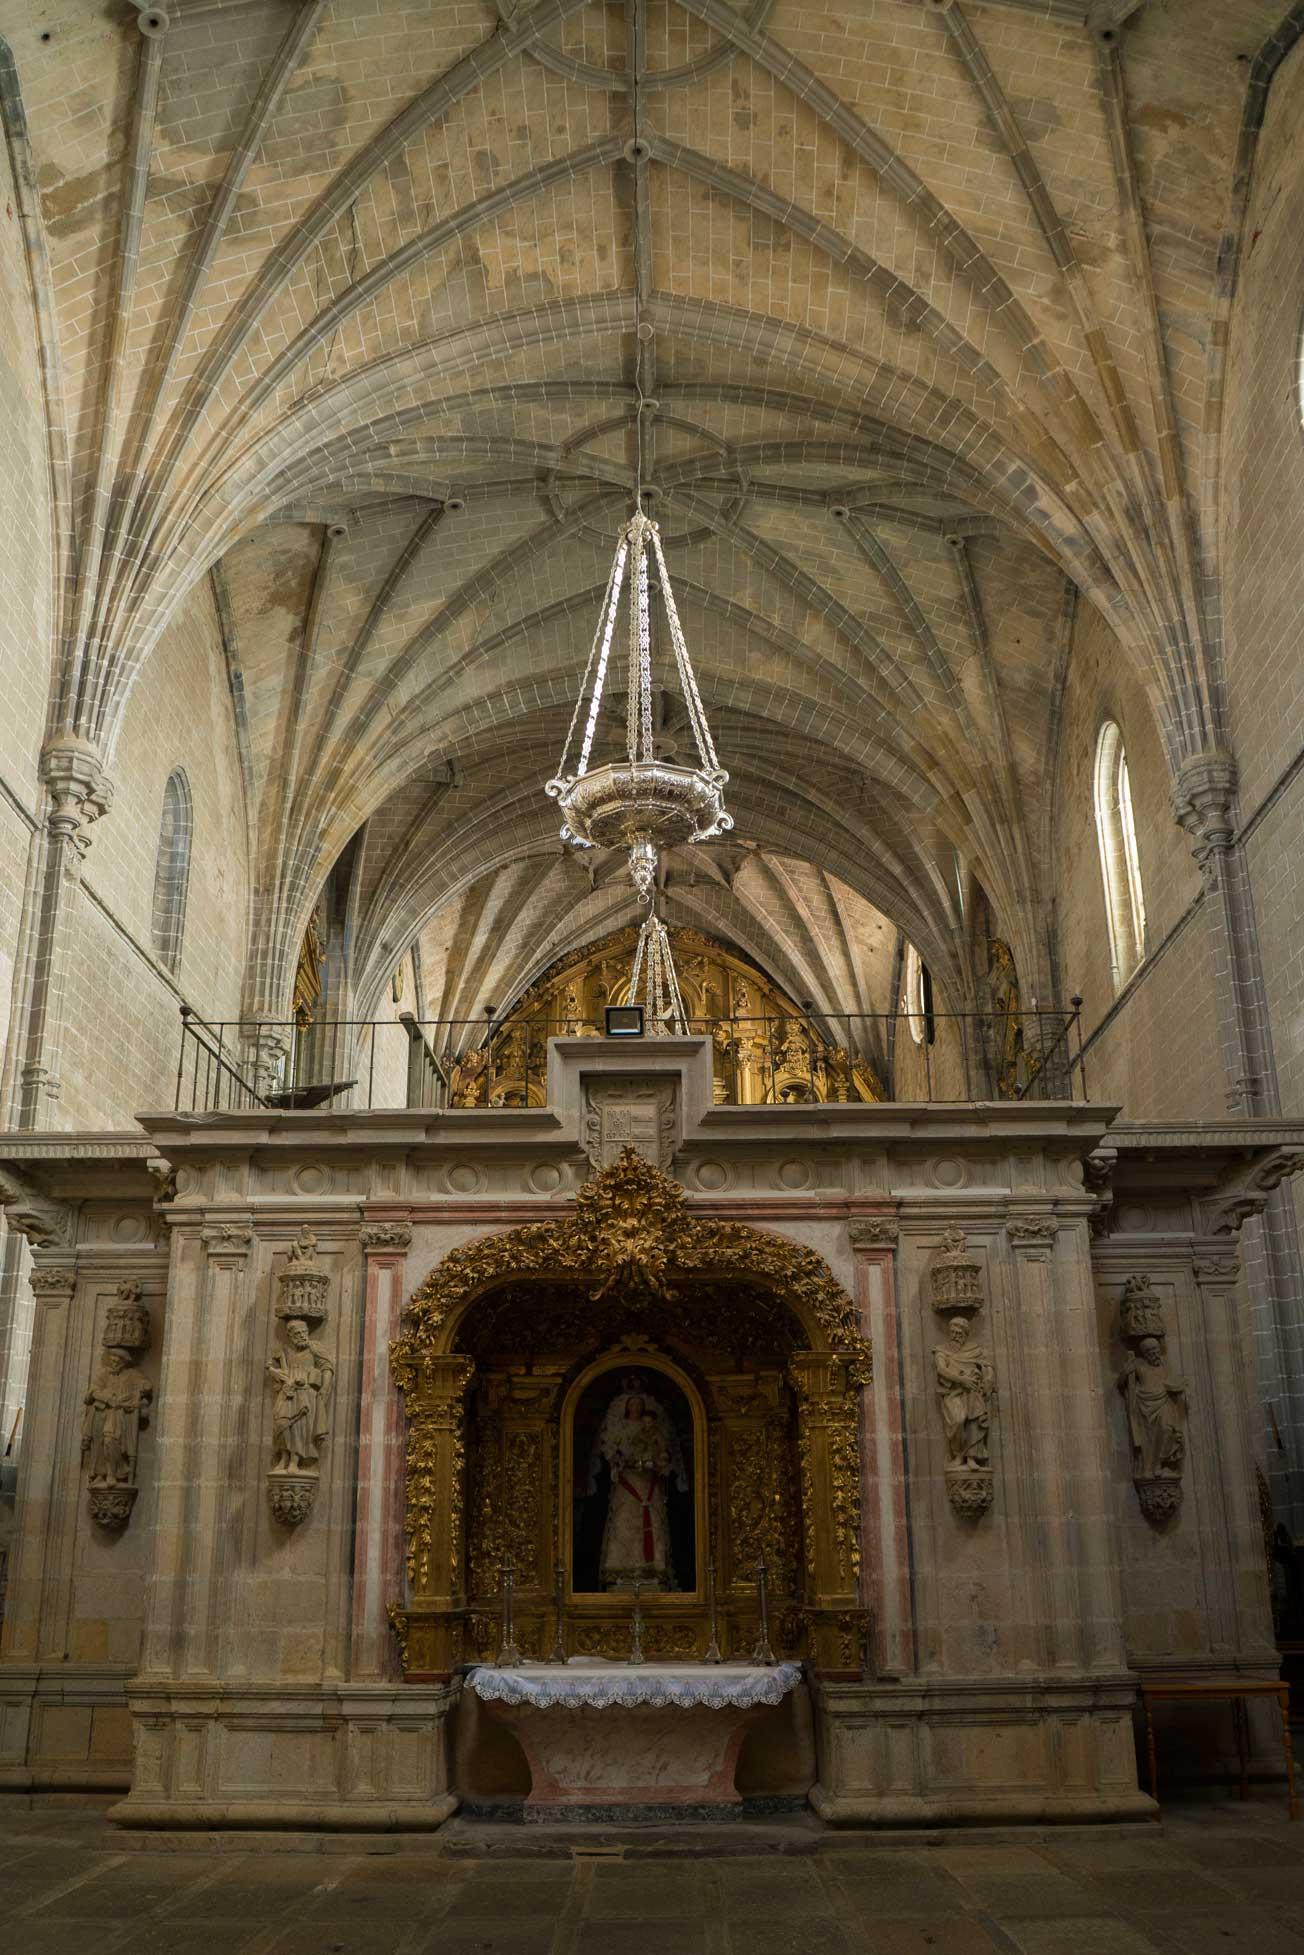 Transcoro com retábulo da Virgen del Rosario